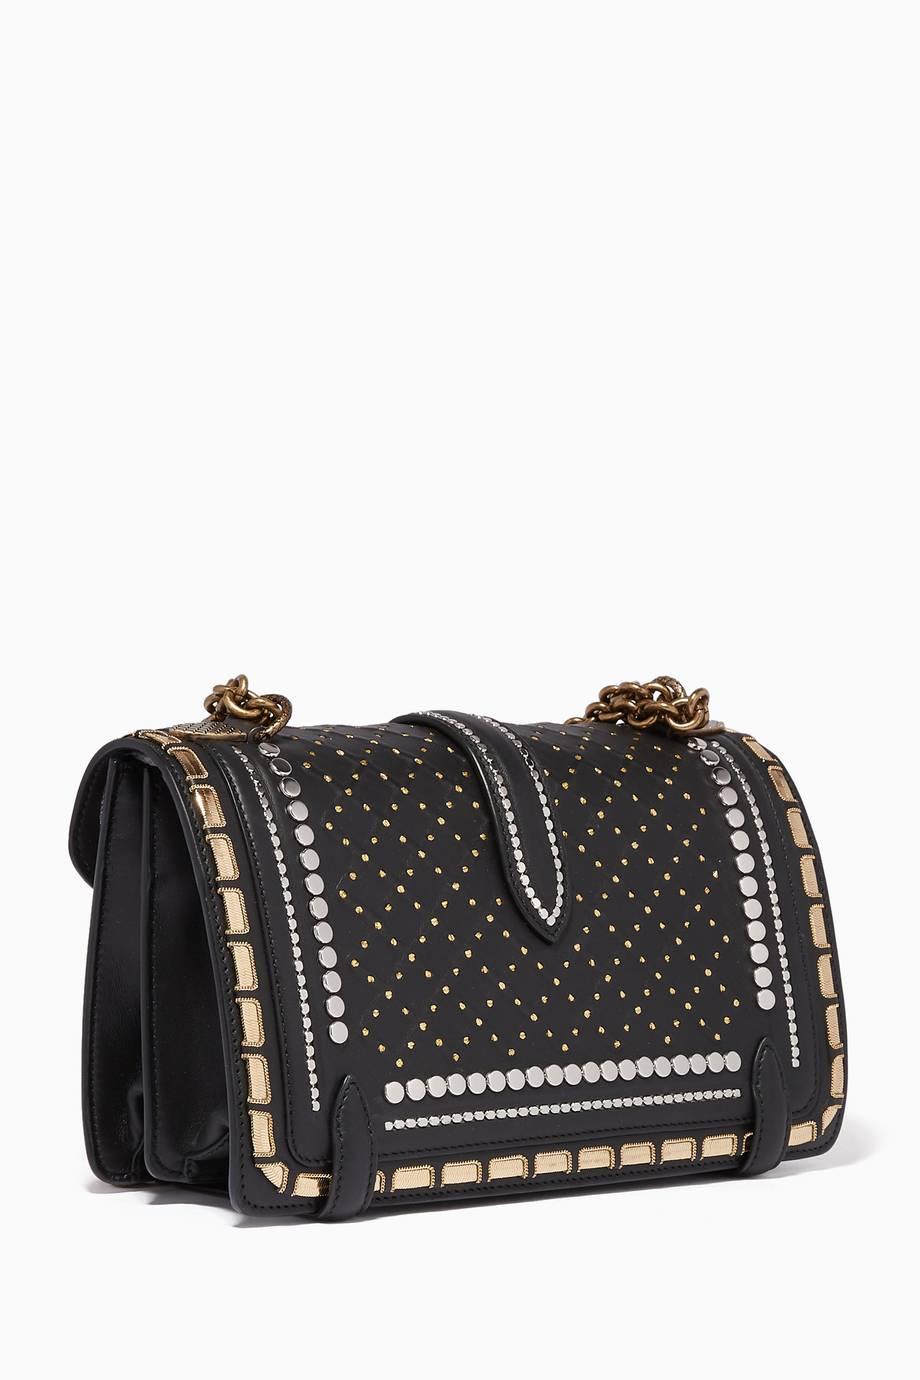 Shop Luxury Bottega Veneta Black Catena Studded City Knot Shoulder ... d76878c8ecbd6